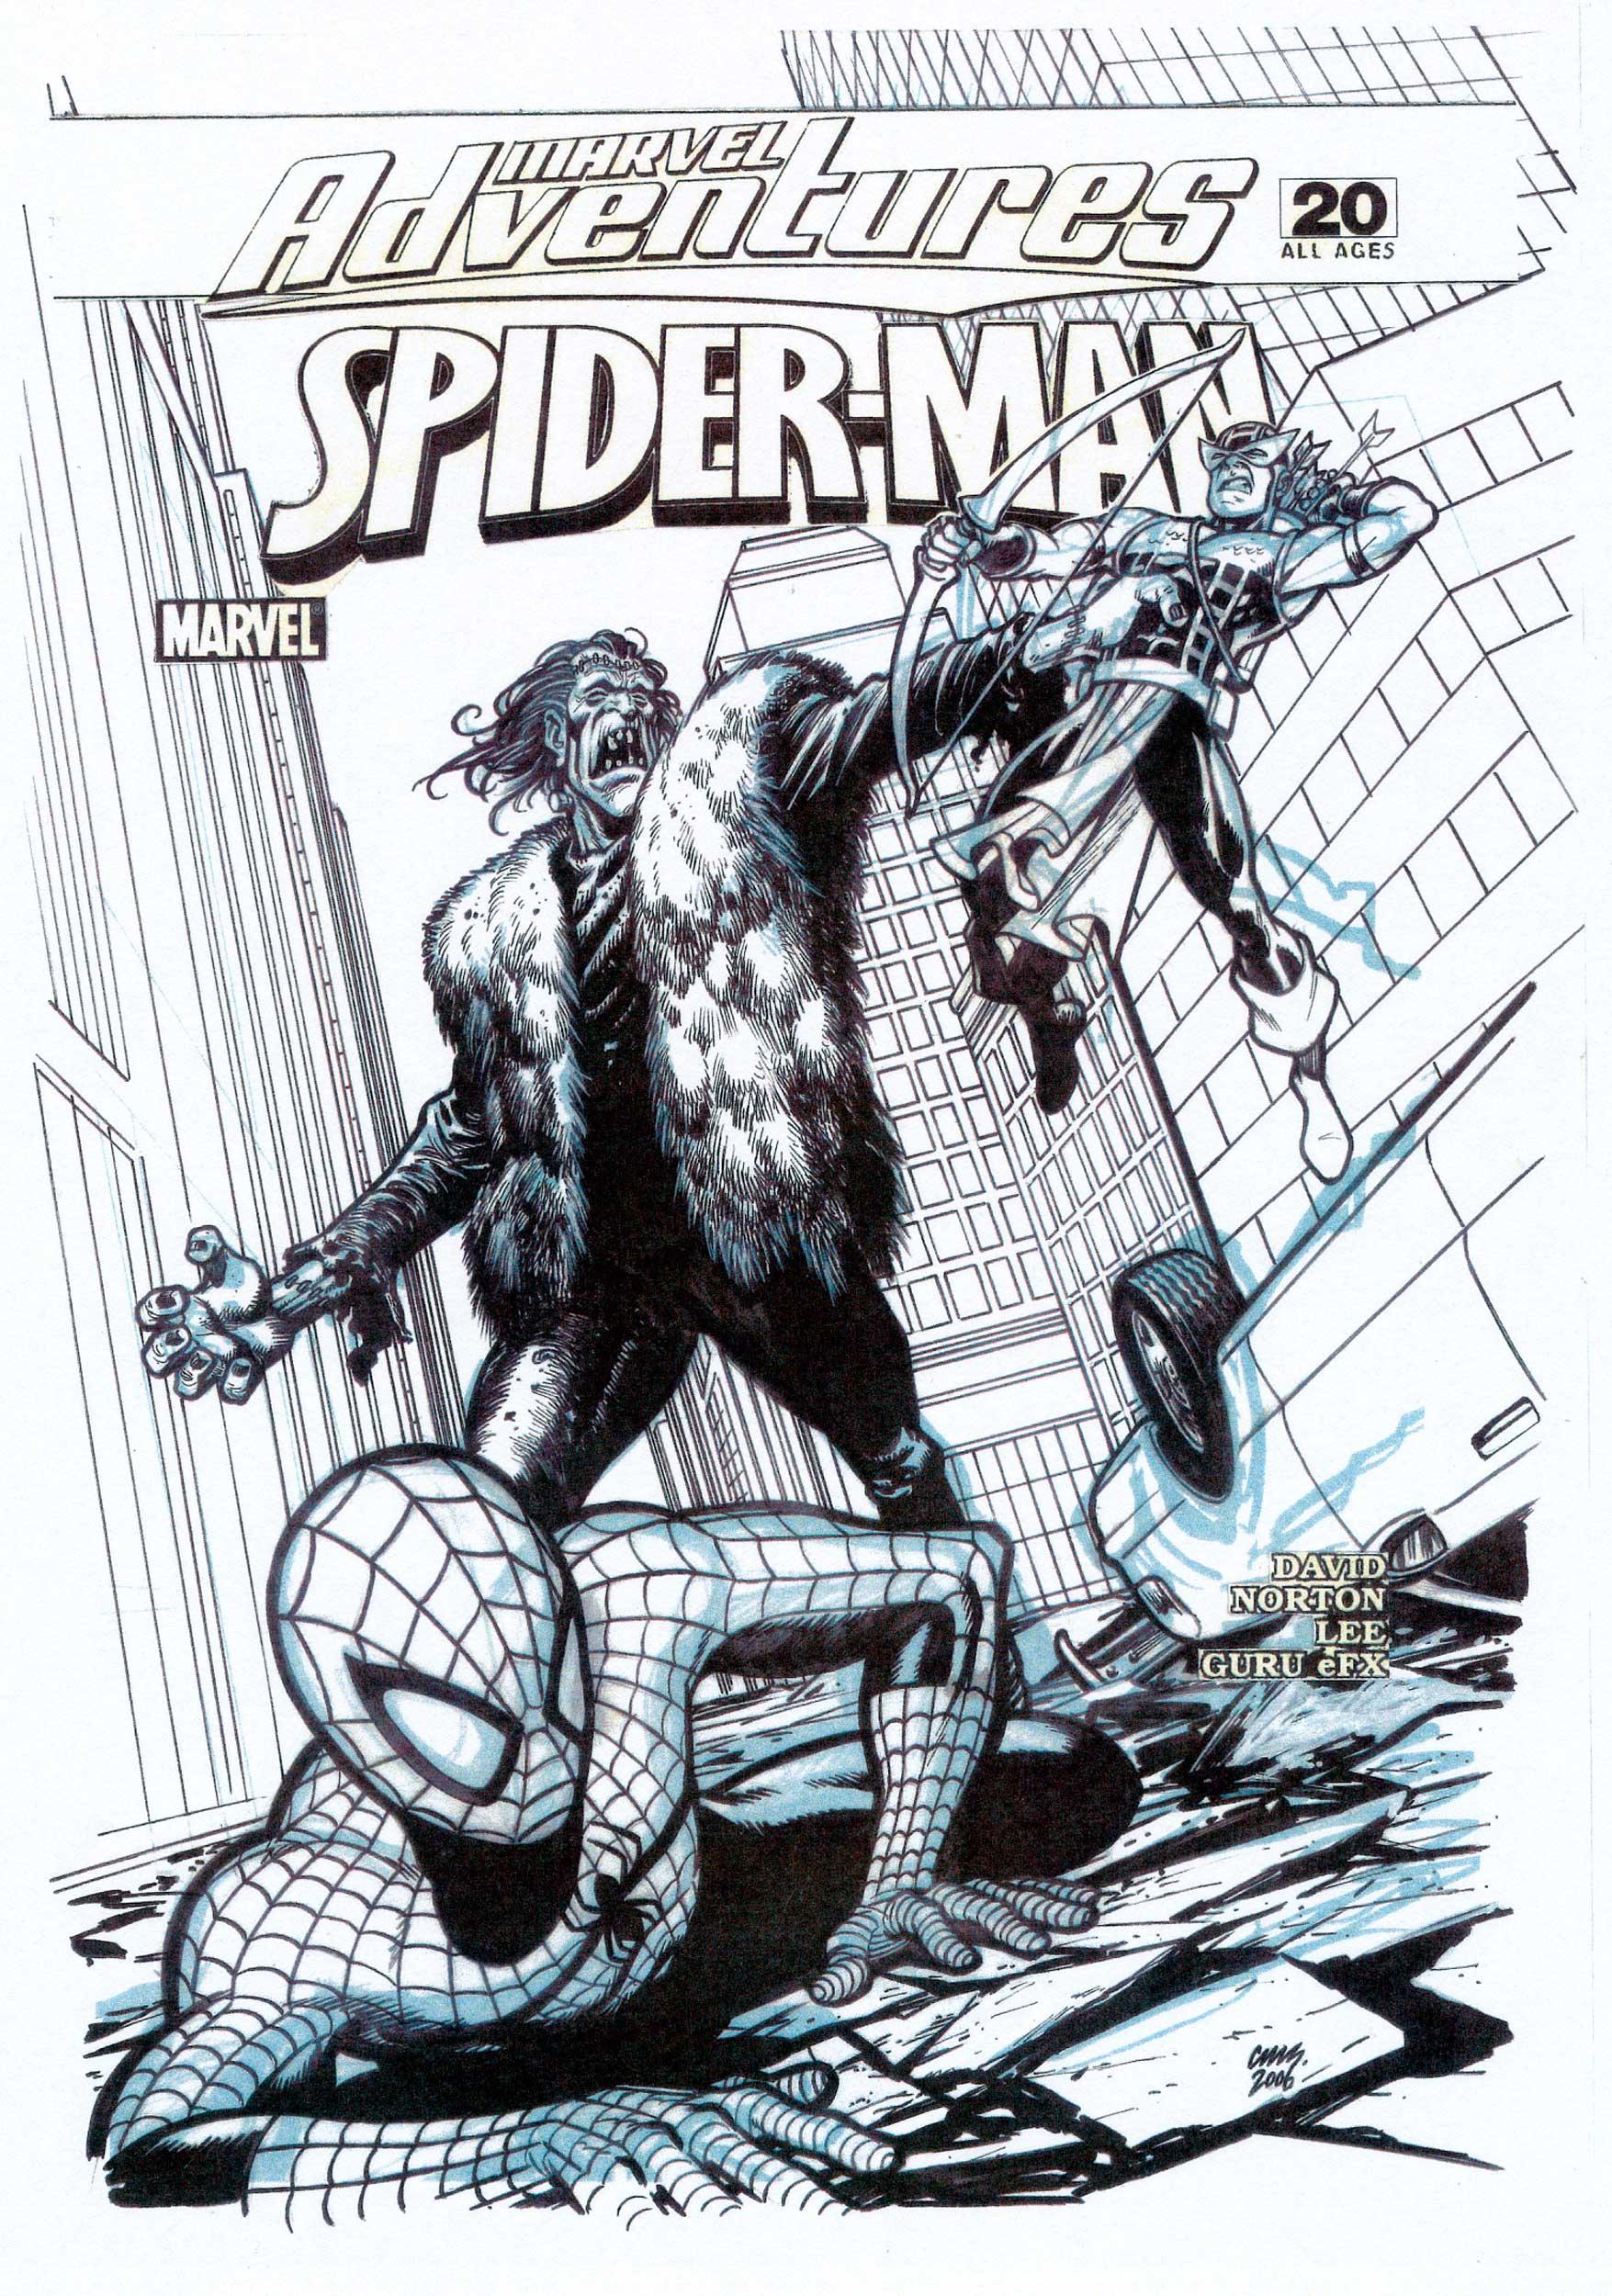 CAMERON STEWART 2006 MARVEL ADV. SPIDER-MAN #20 COVER Comic Art